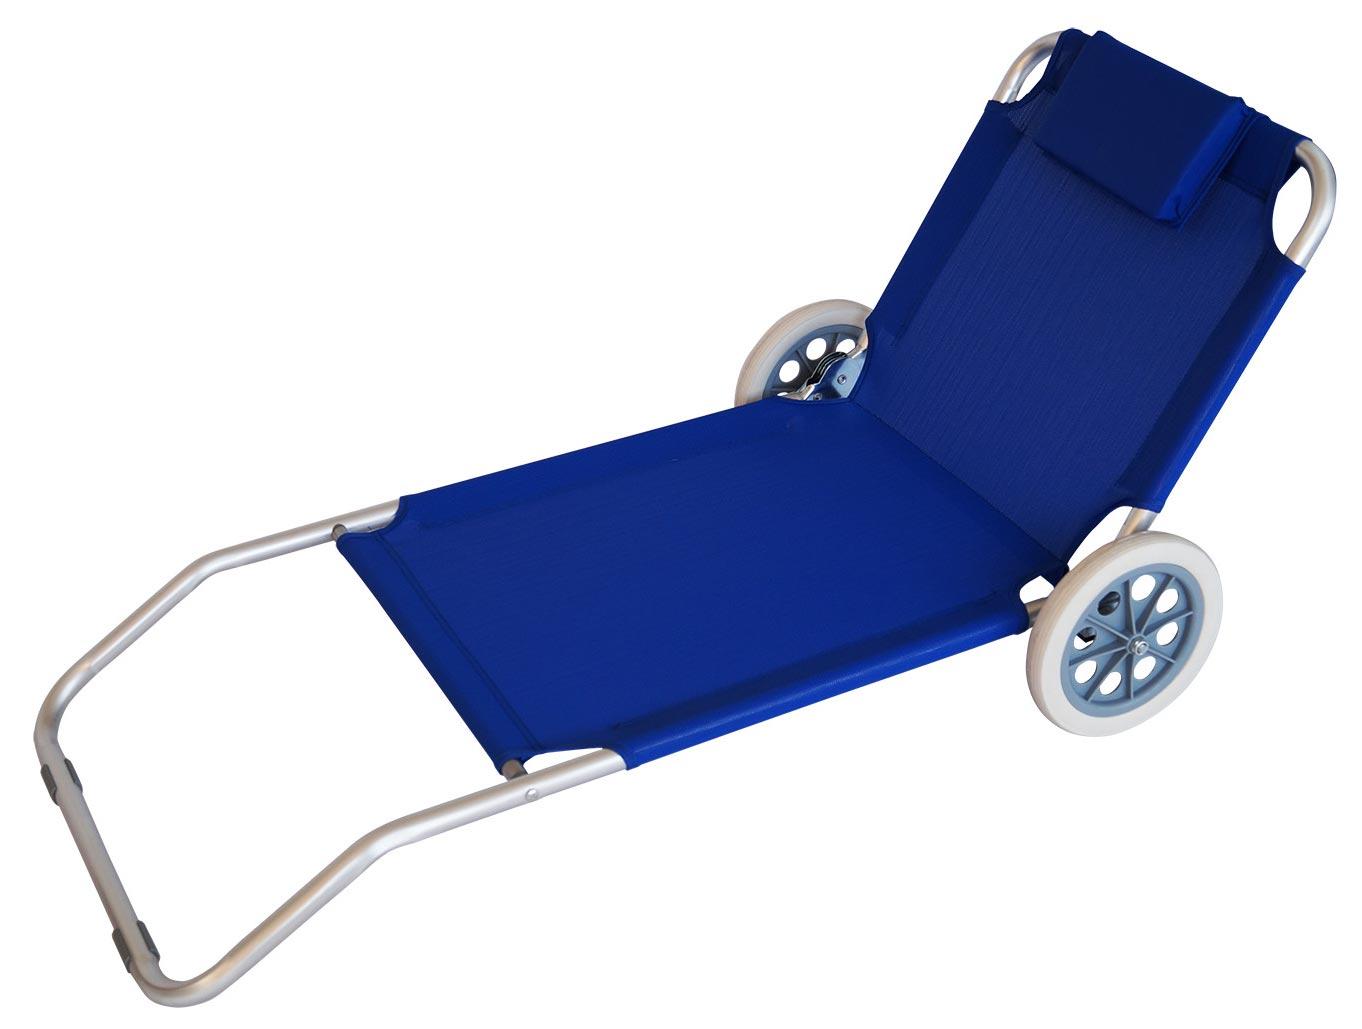 strandwagen fg29 transportwagen strandstuhl strandliege aluminiumgestell 106x64x62cm kaufen. Black Bedroom Furniture Sets. Home Design Ideas